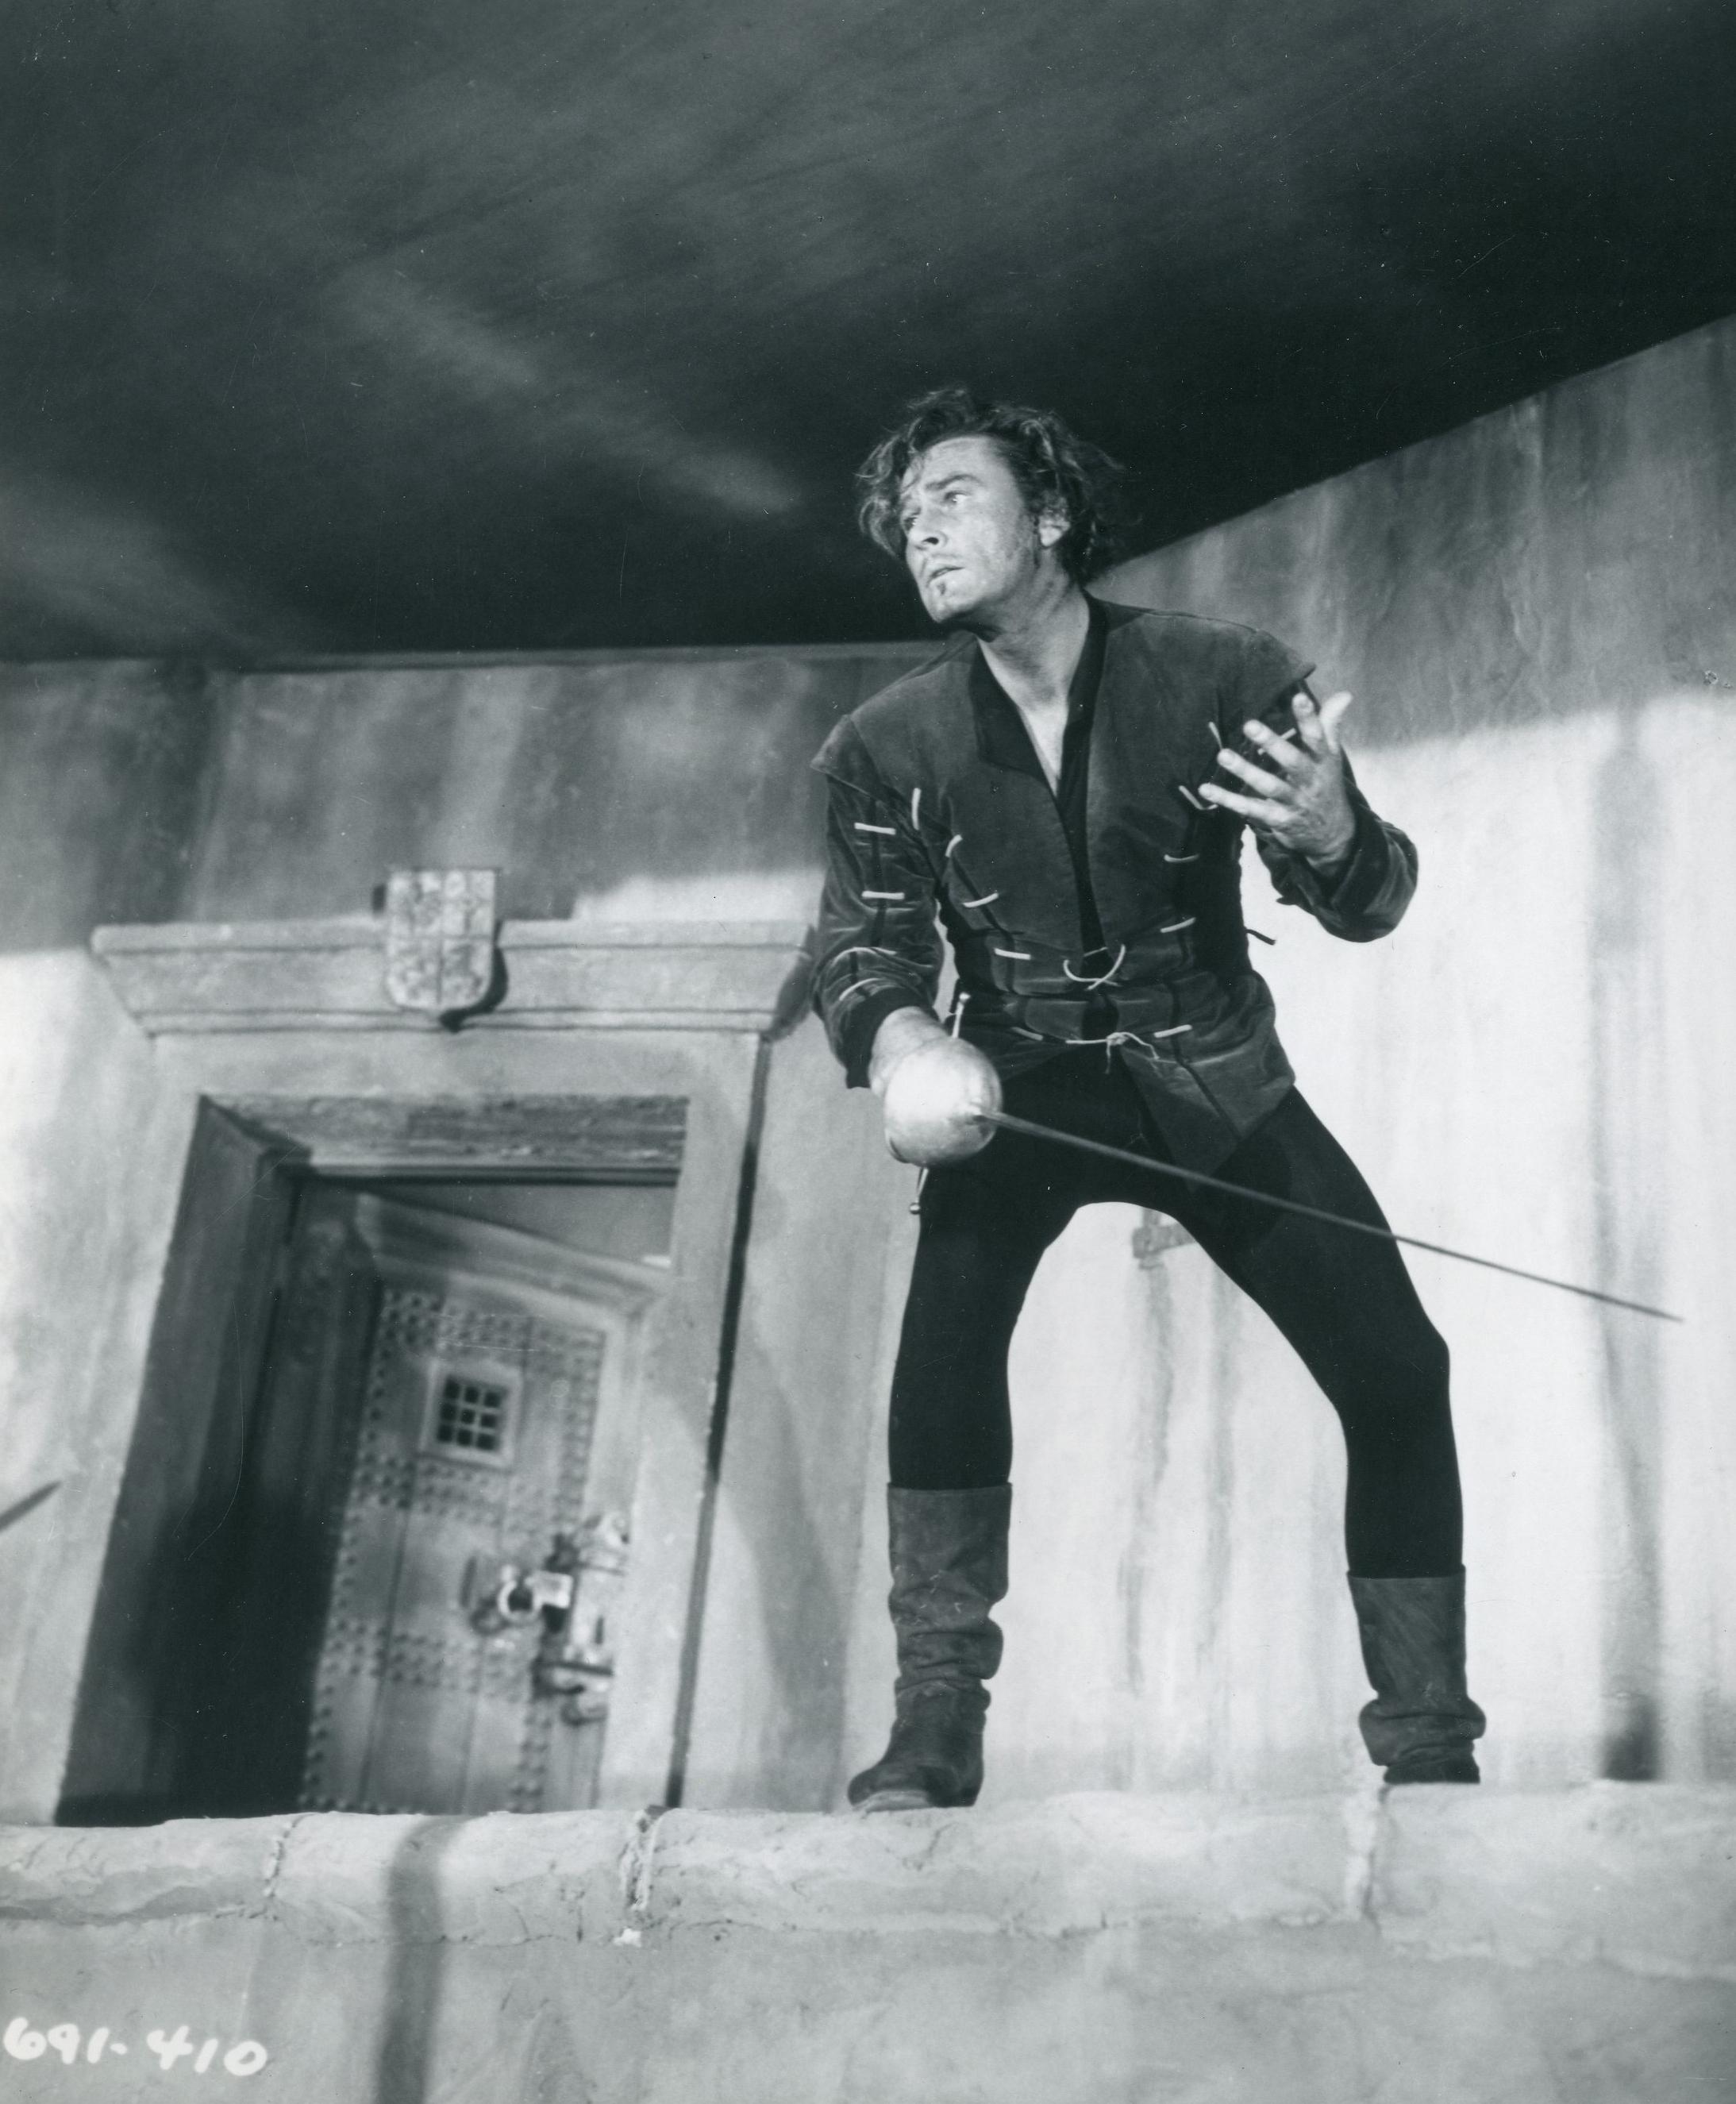 Adventures Of Don Juan 1948 ☆ ☆ ☆ Filmbobbery